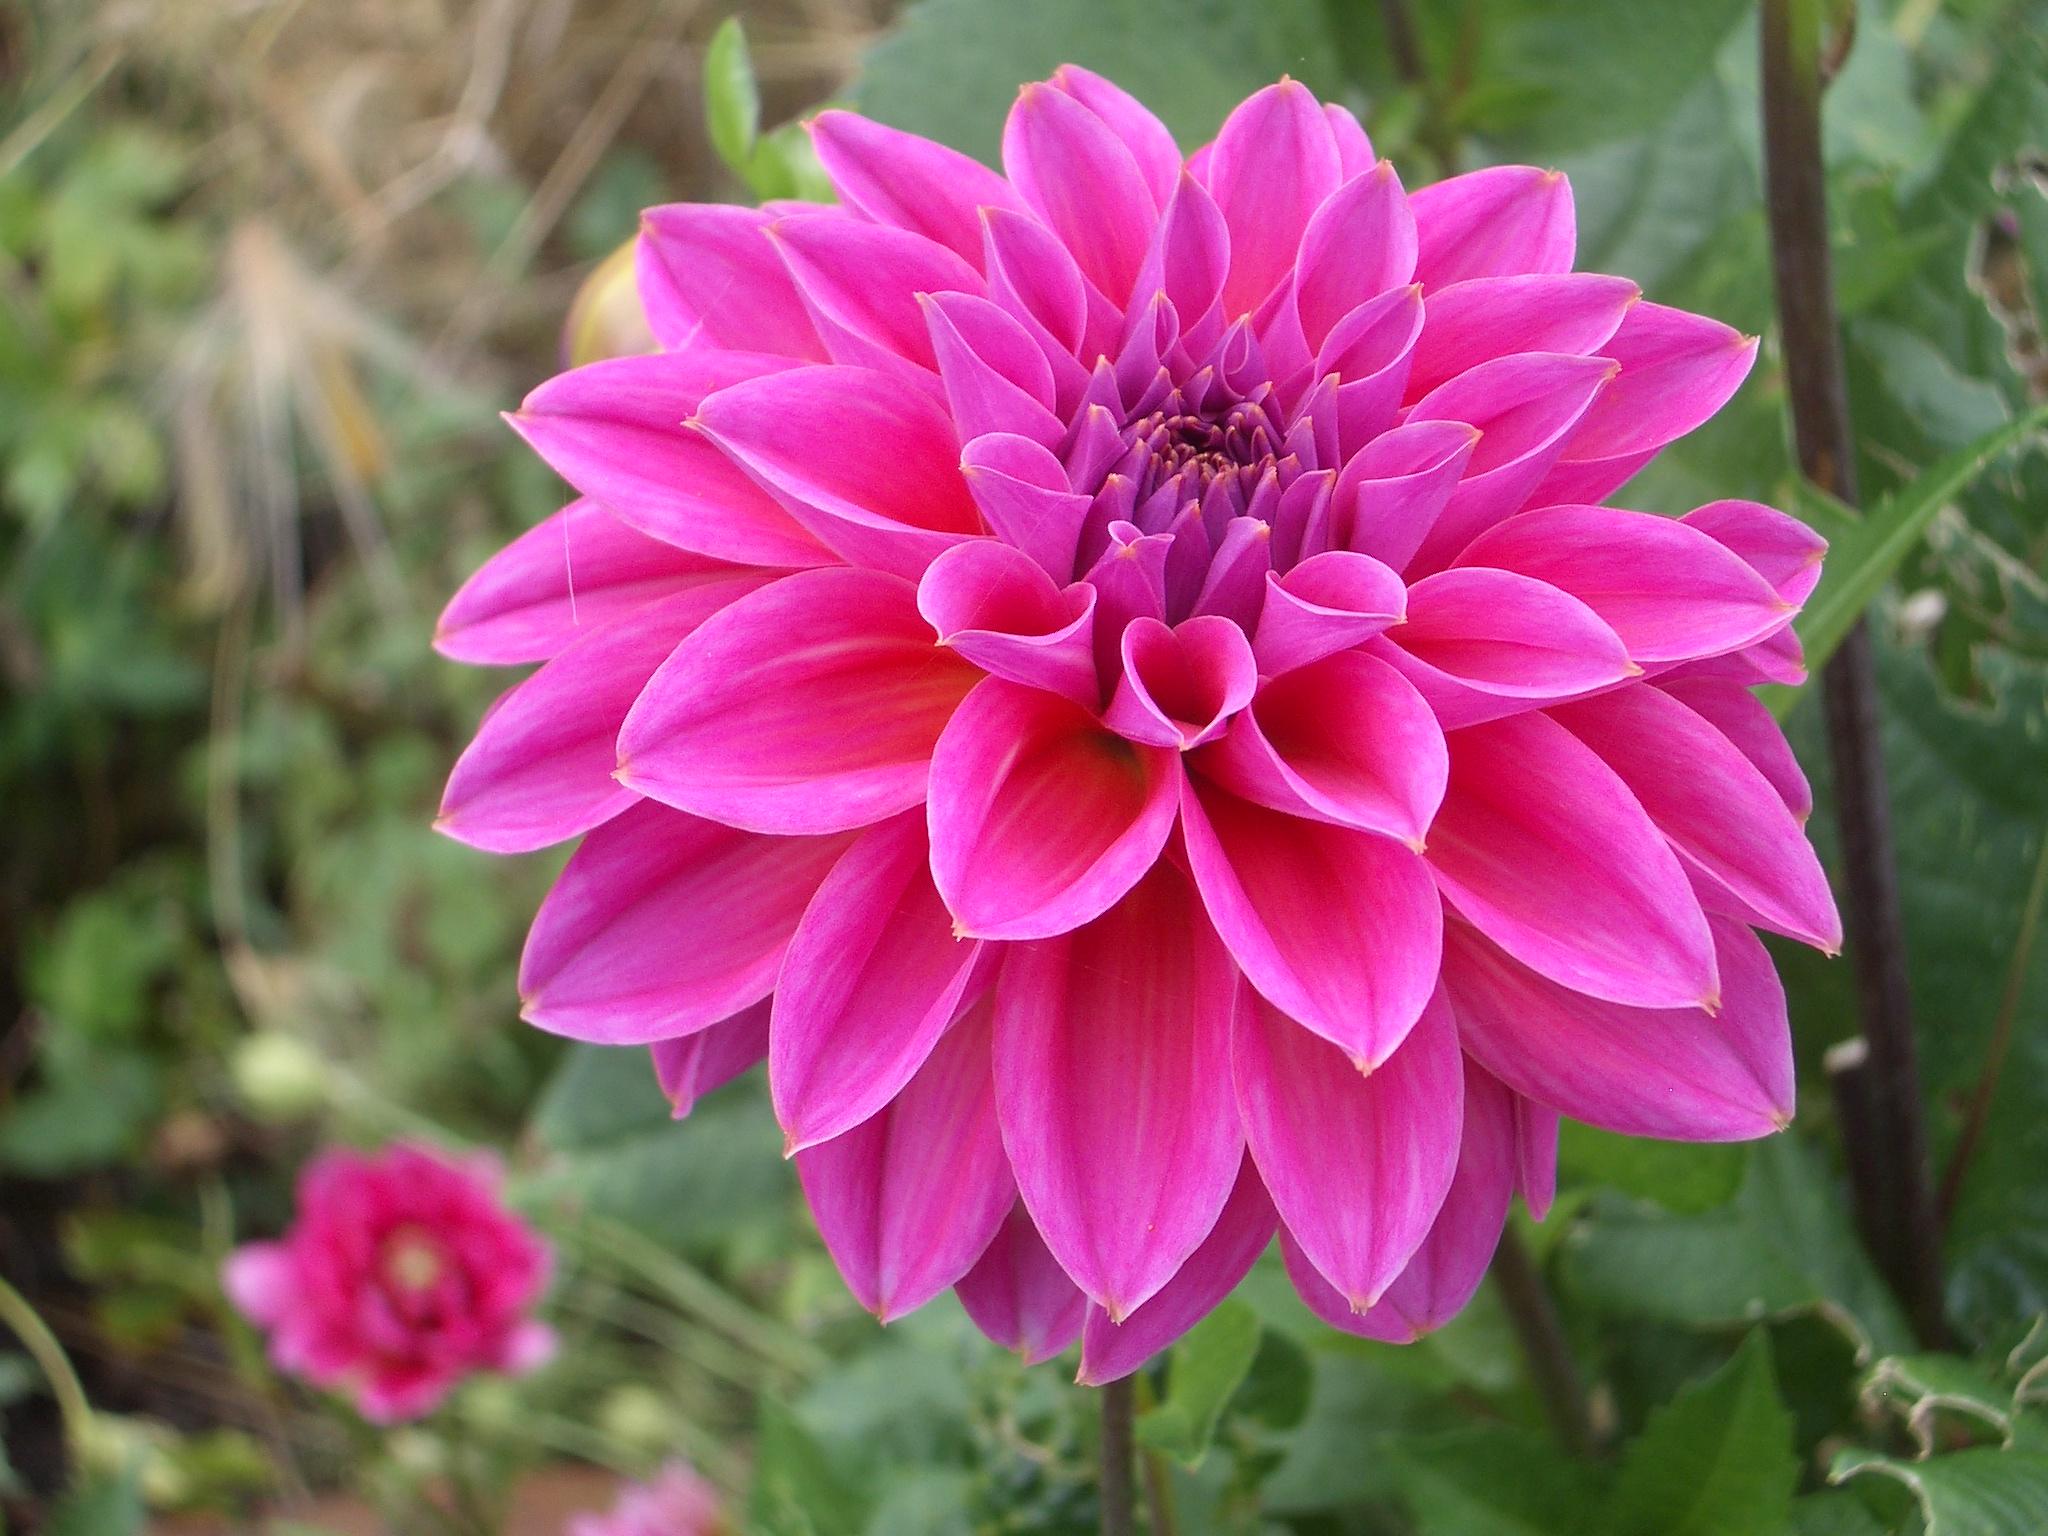 free photo red petaled flower macro nature hd wallpaper free